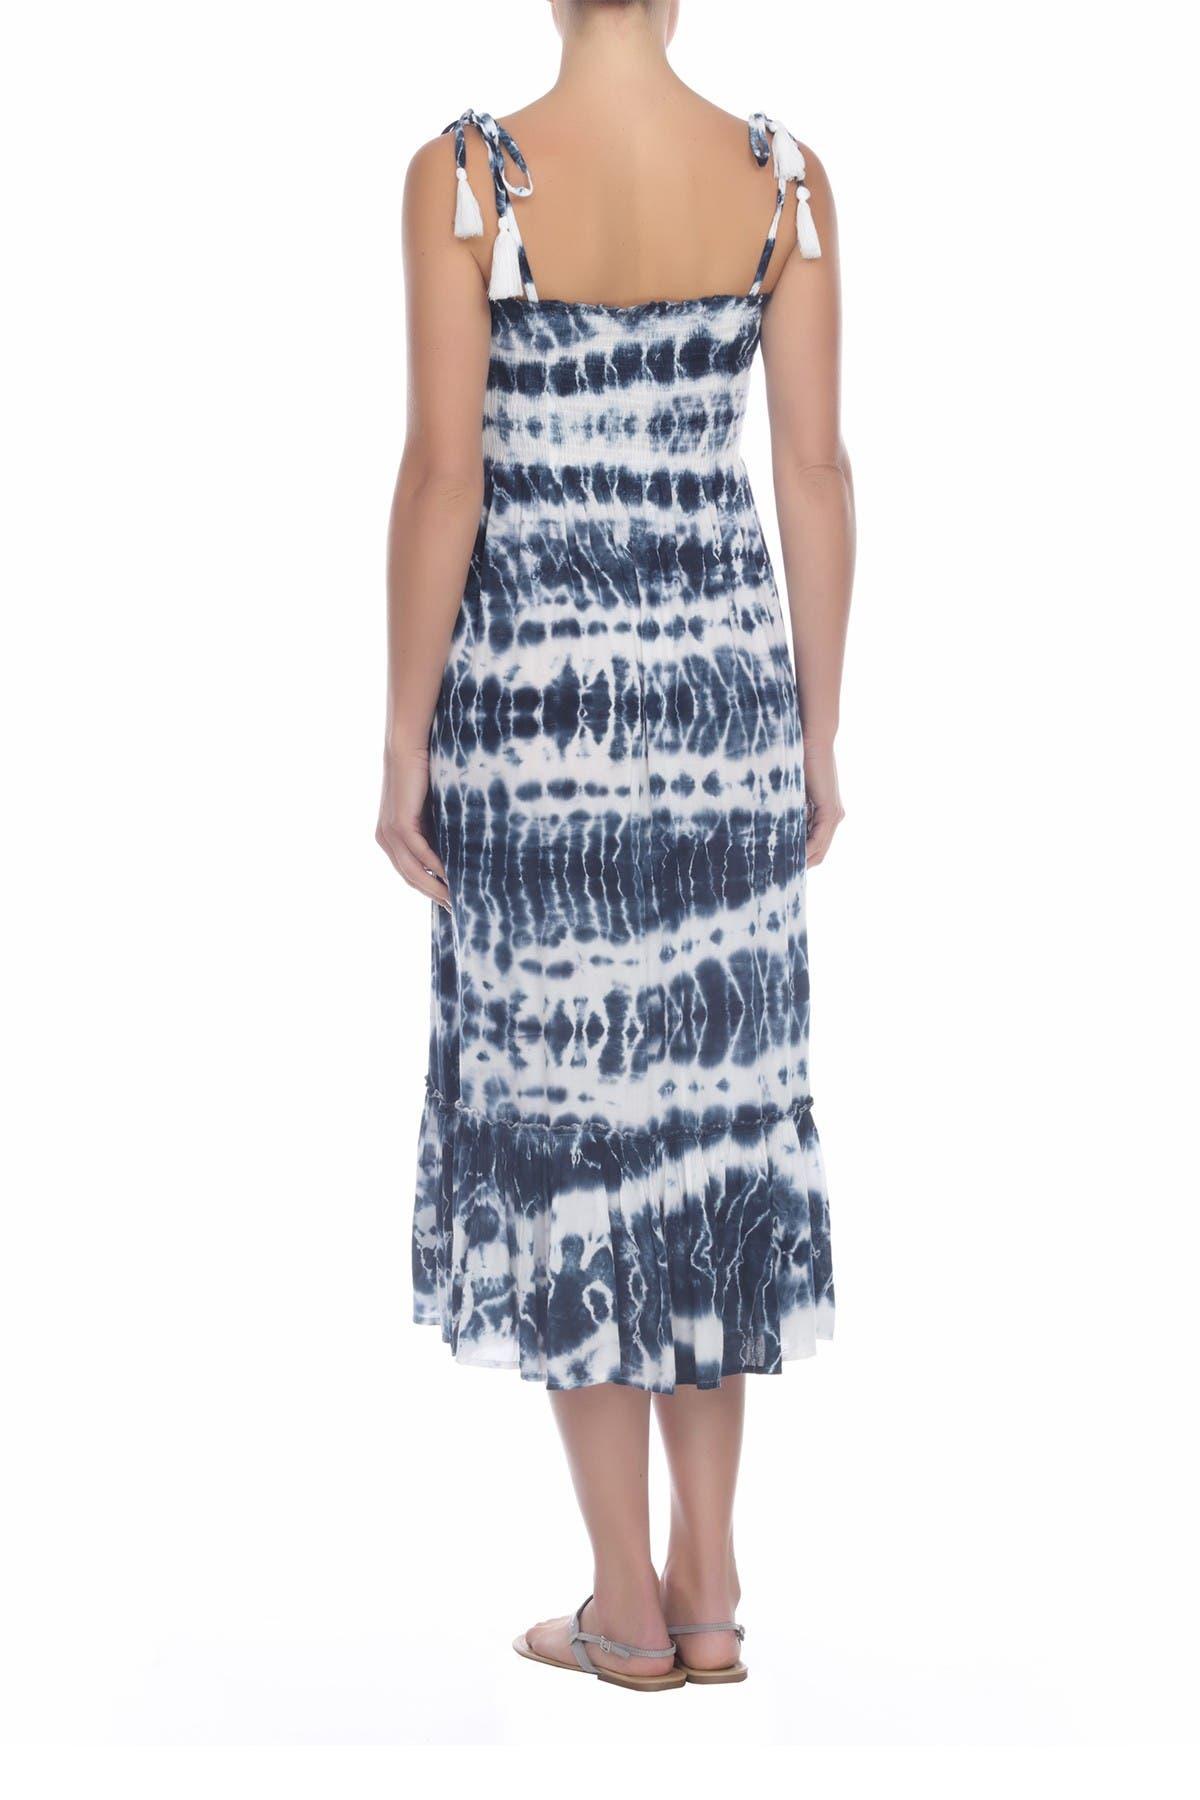 Image of BOHO ME Smocked Tie Dye Midi Dress